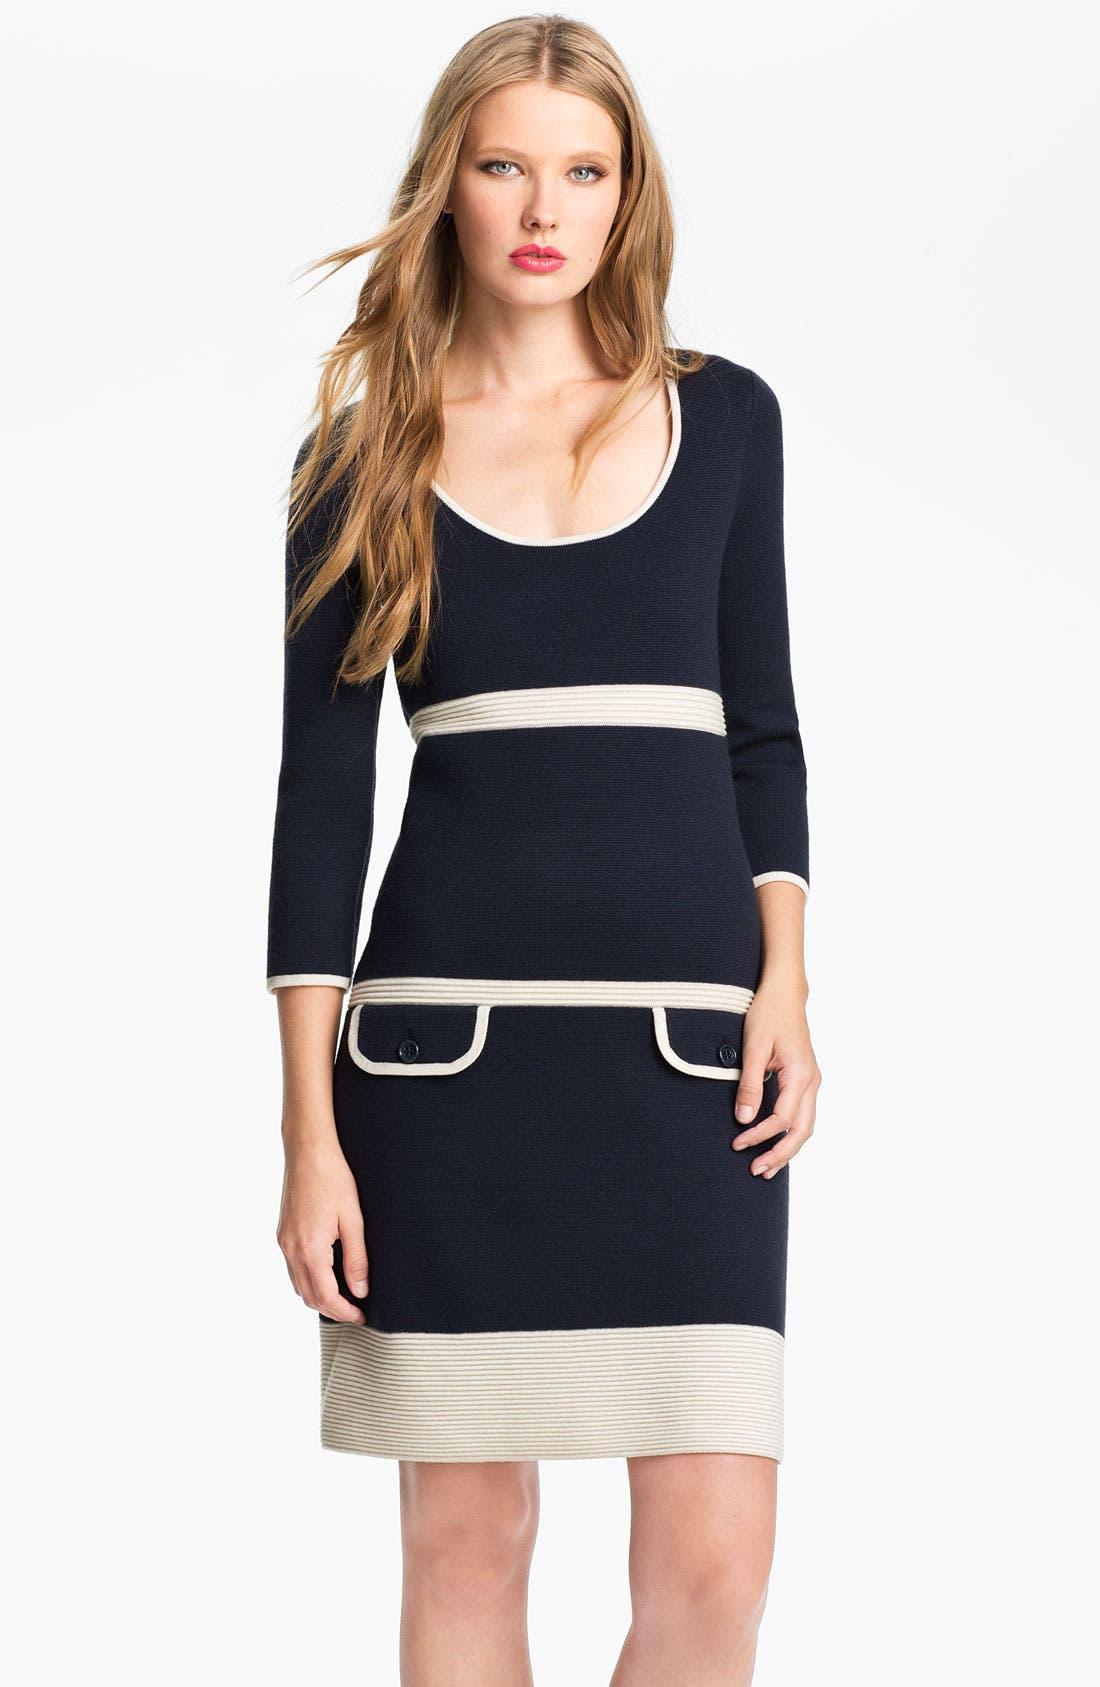 Alternate Image 1 Selected - kate spade new york 'cathie' merino wool sweater dress